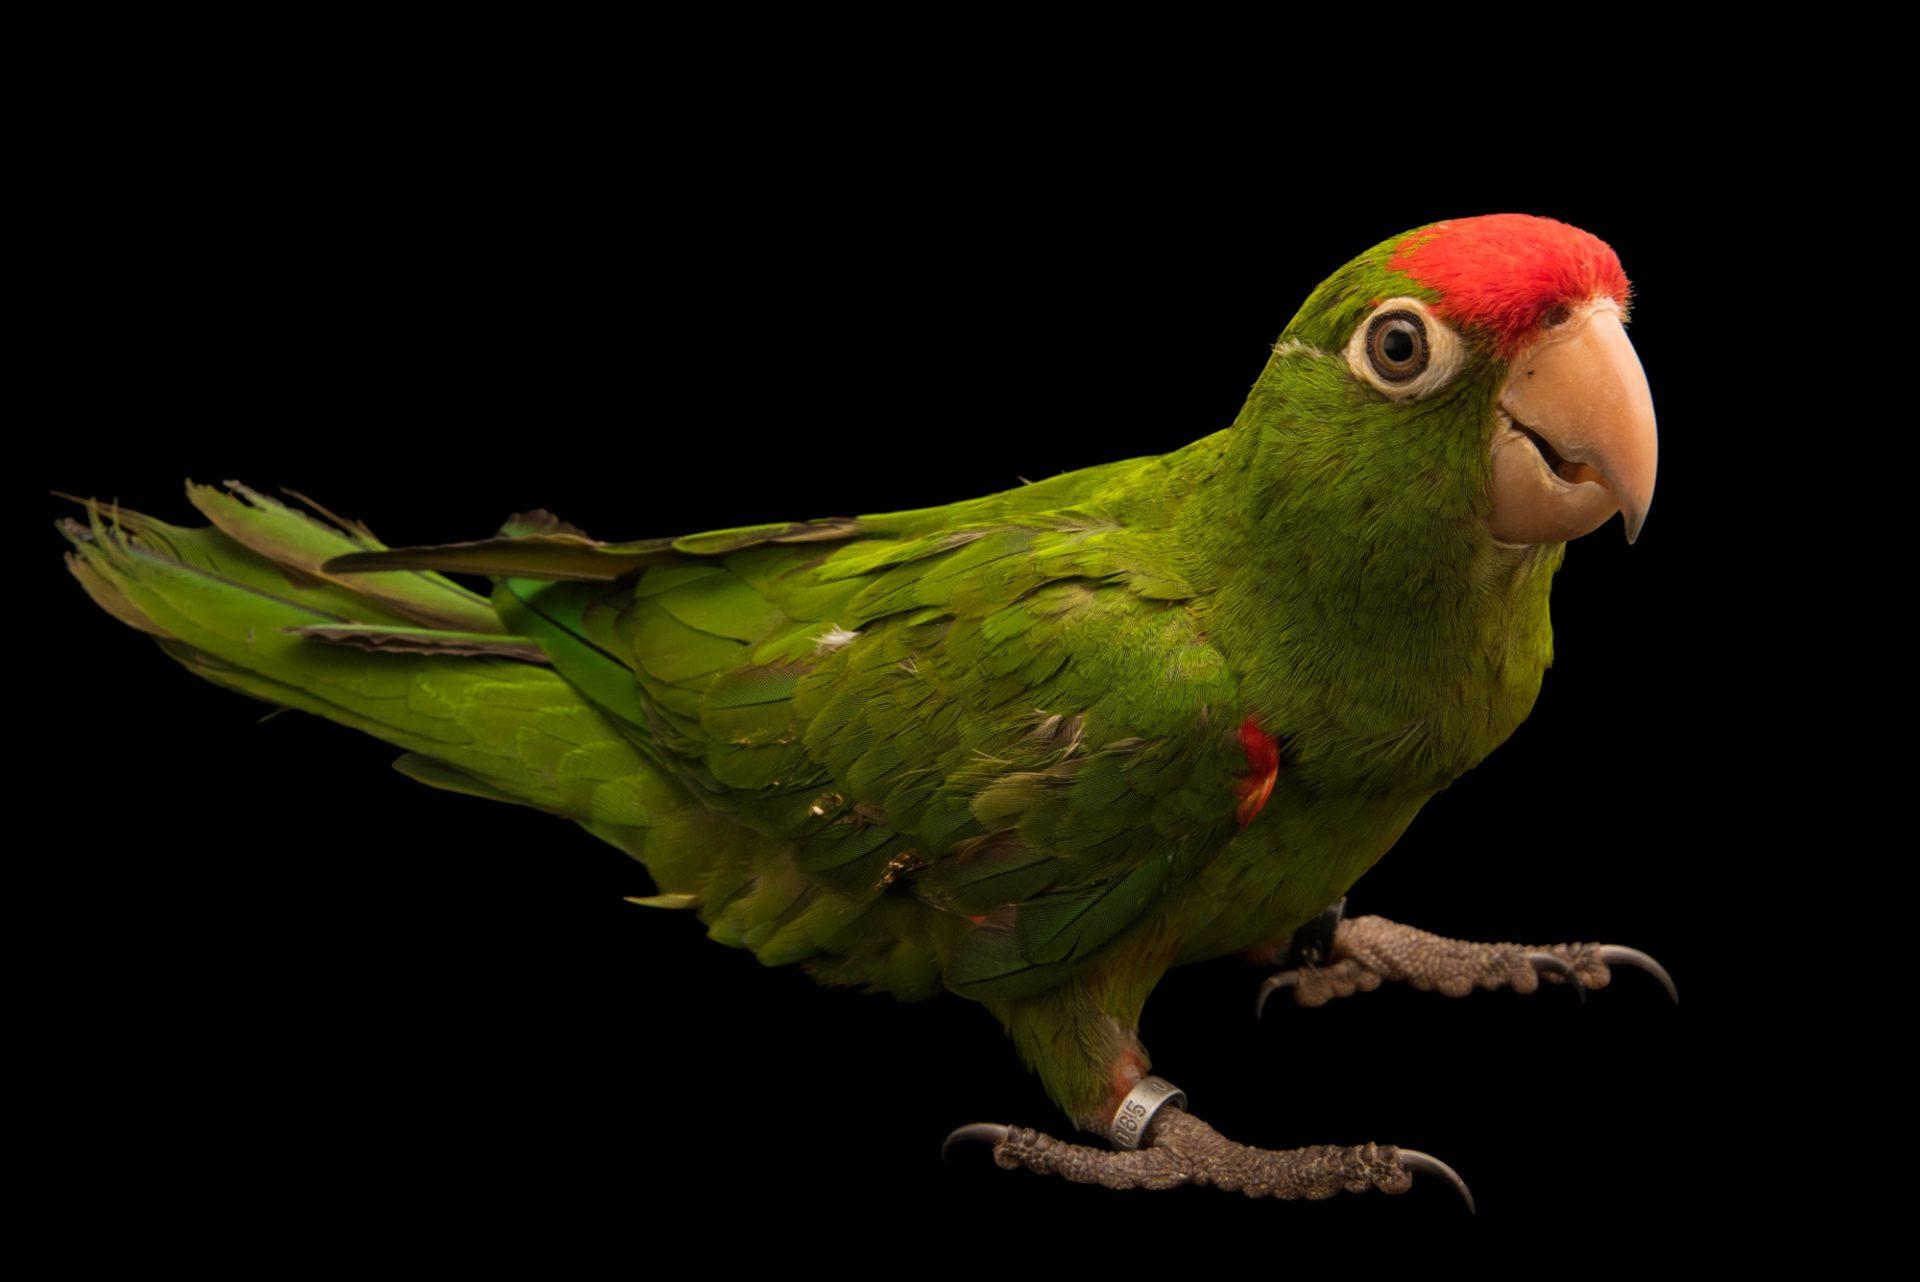 Photo: A cordilleran parakeet (Psittacara frontatus minor) at Loro Parque Fundacion.